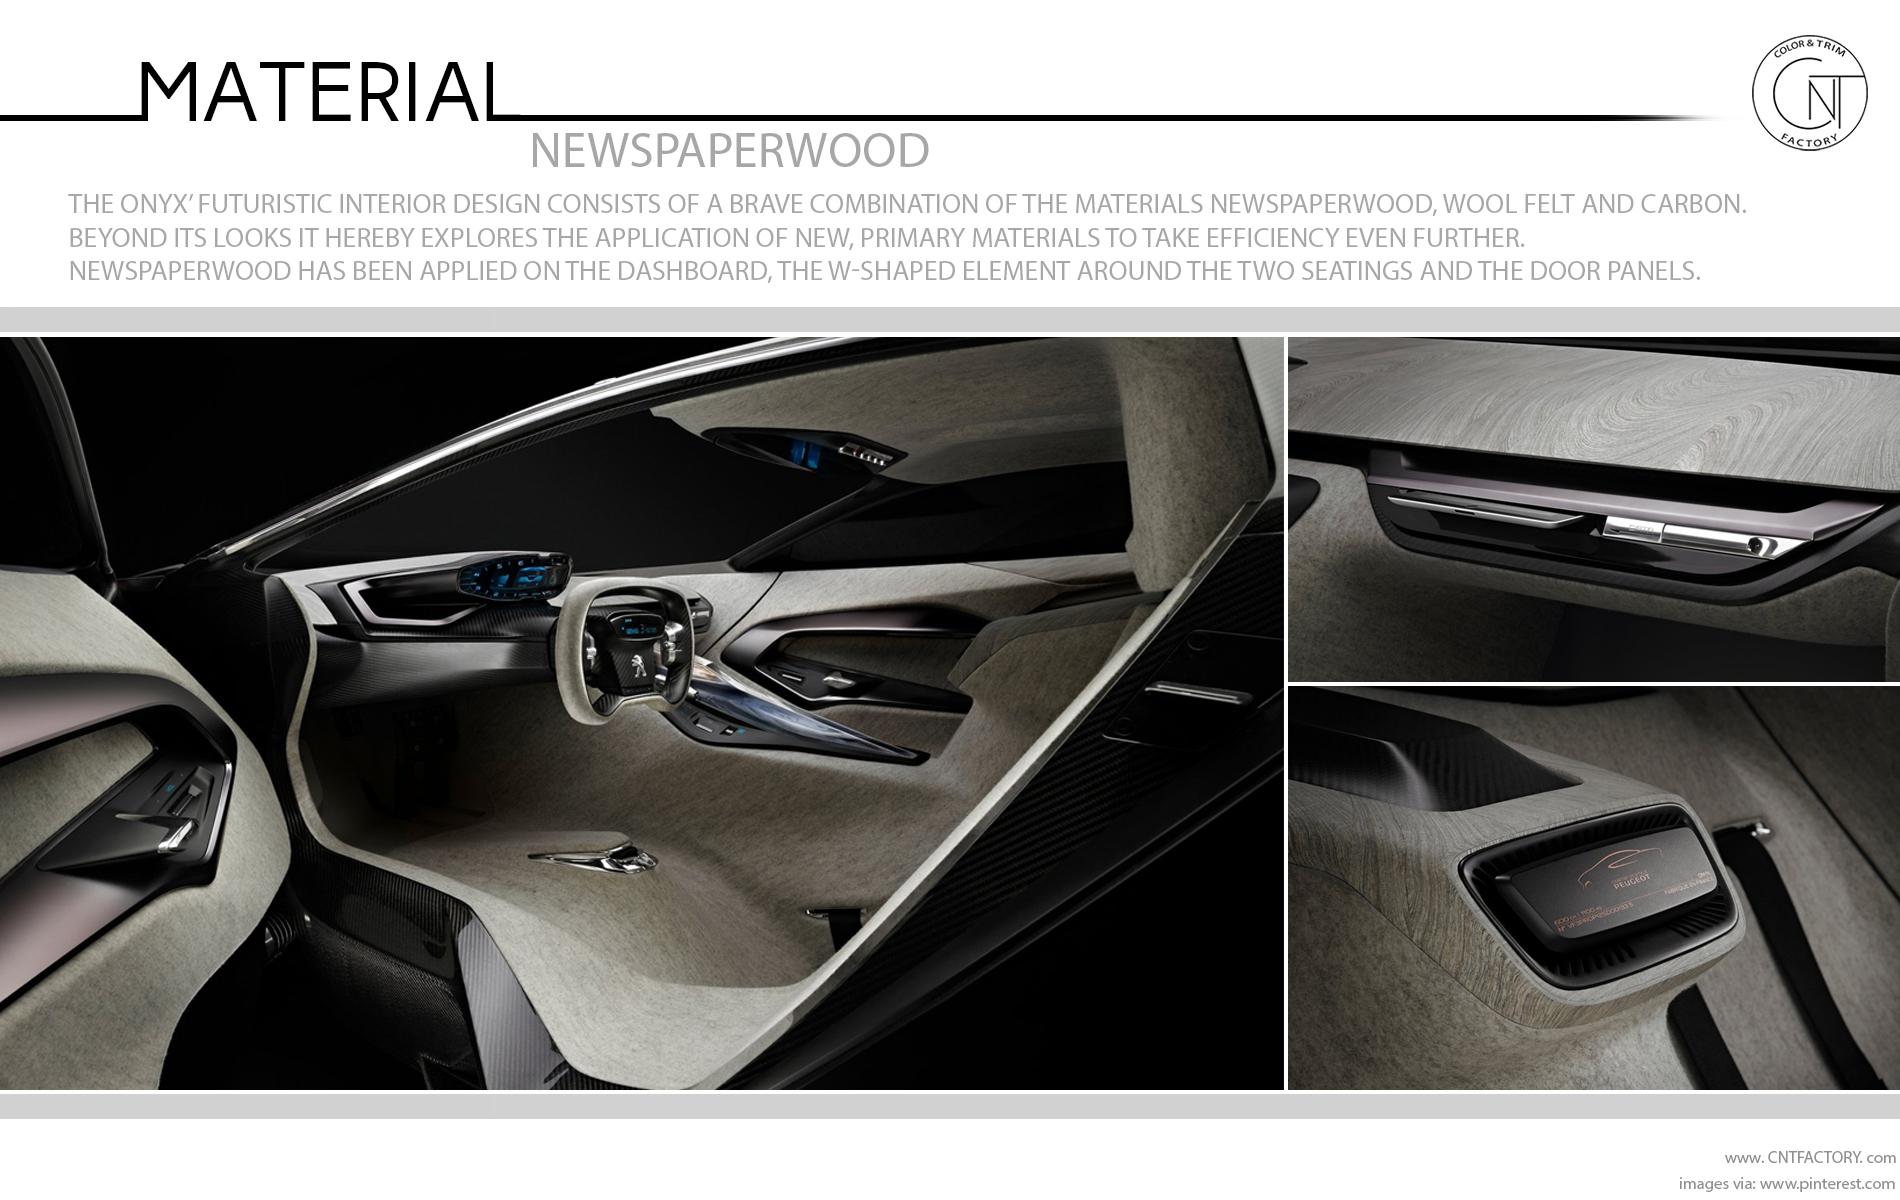 newspaperwood Peugeot Onyx Concept